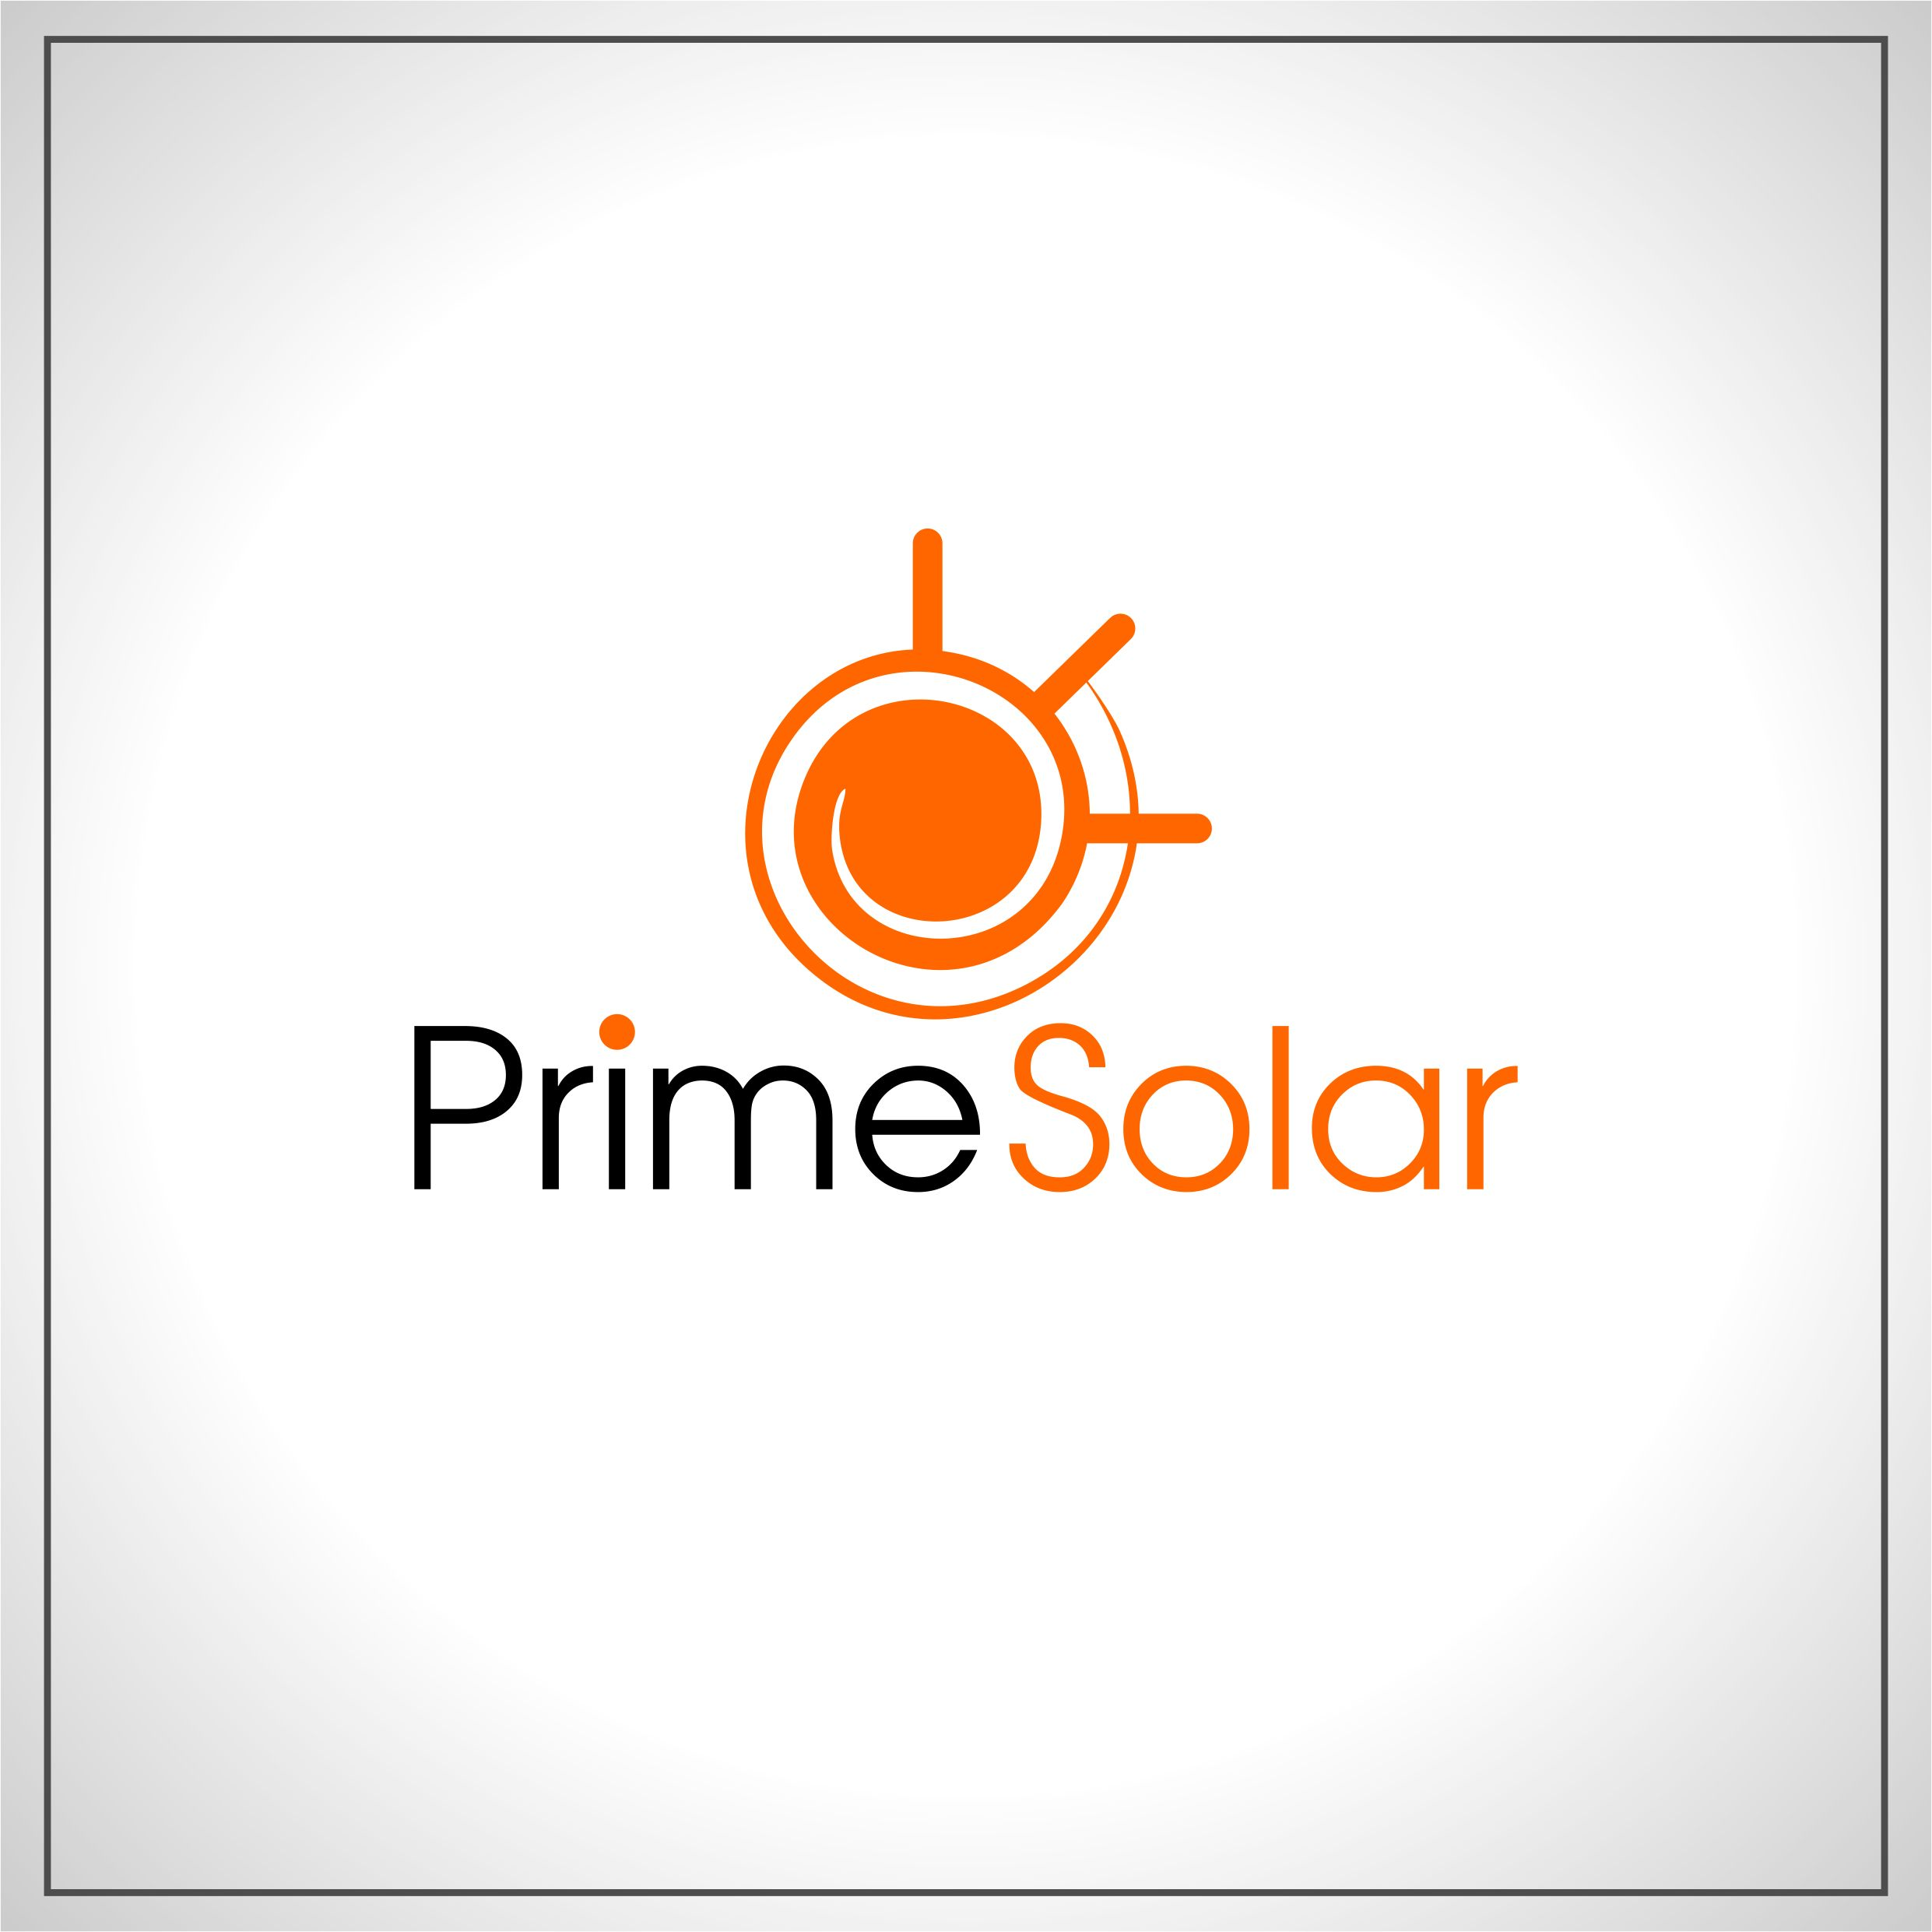 Логотип компании PrimeSolar [UPD: 16:45 15/12/11] фото f_4eef185670727.jpg